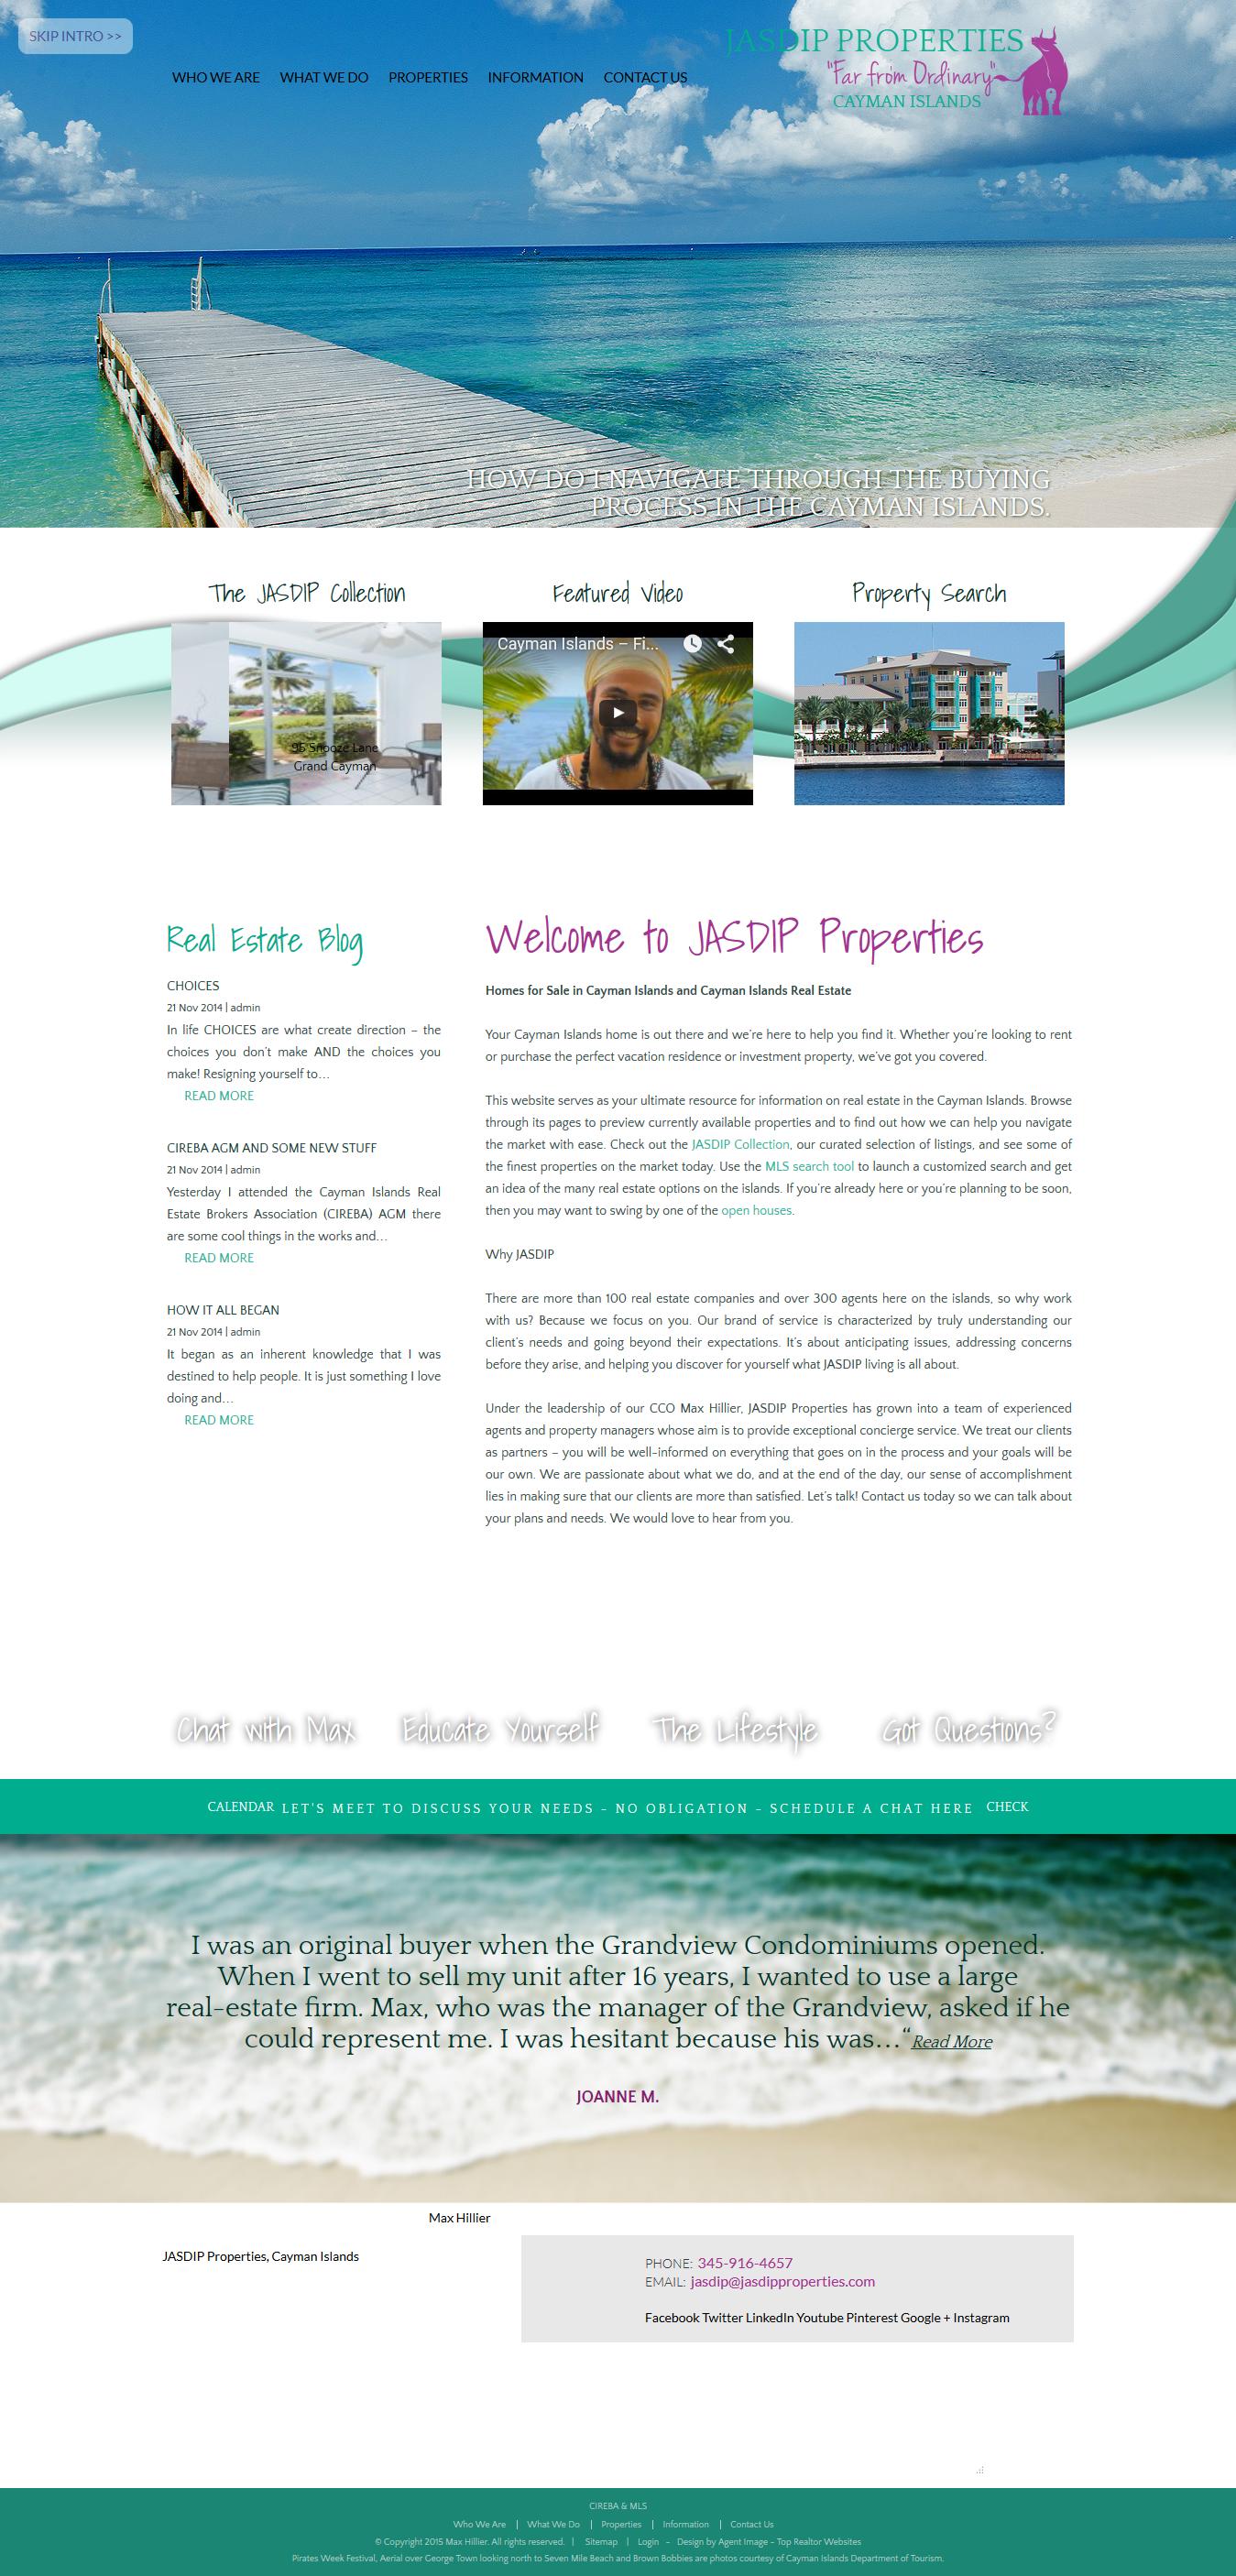 Cayman islands dating website